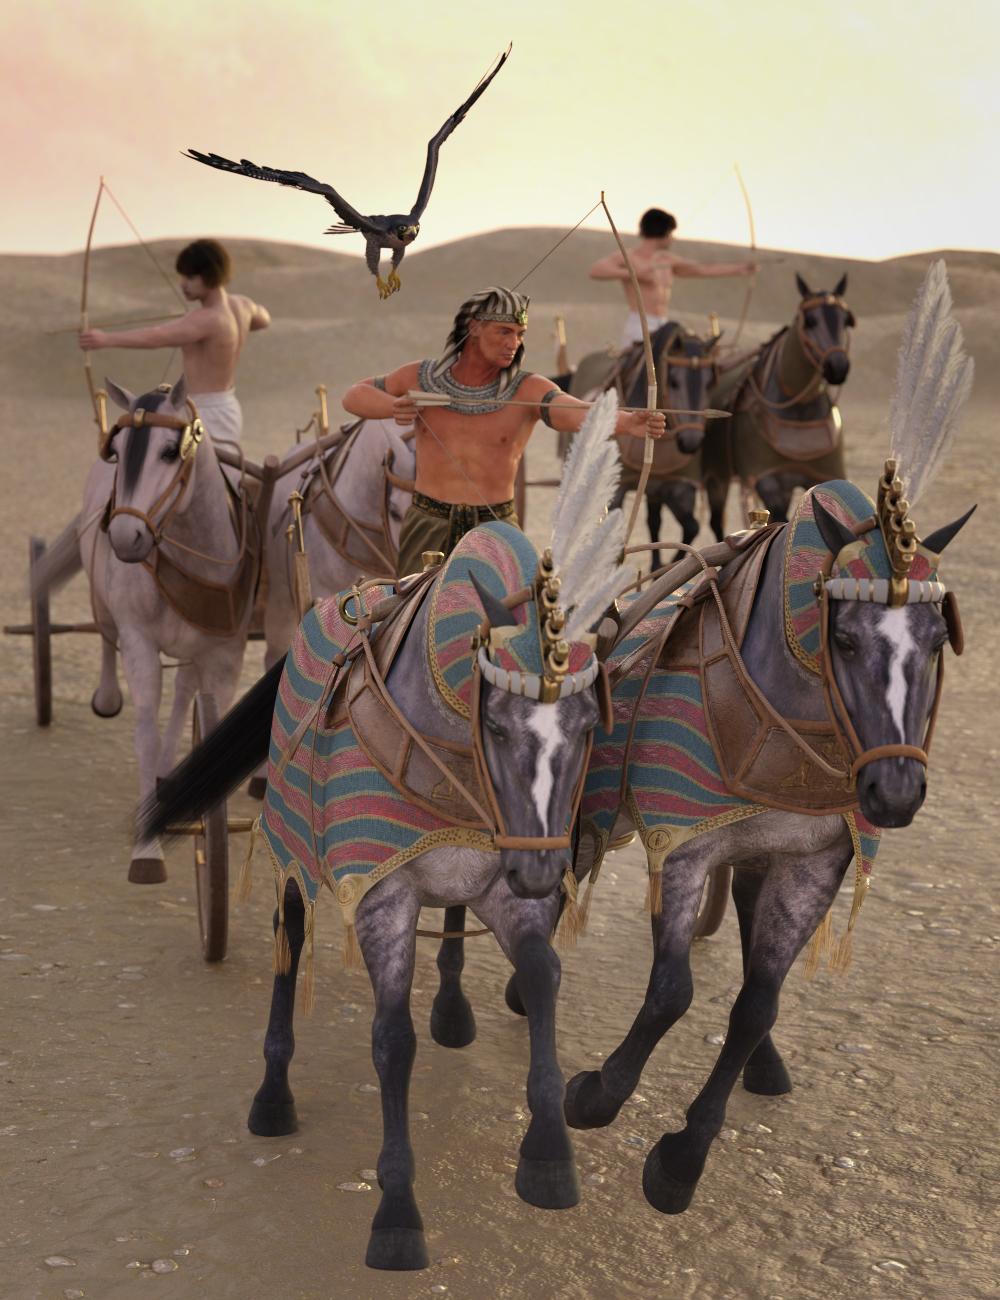 Egyptian Chariot Warfare for Daz Horse 2 by: Deepsea, 3D Models by Daz 3D